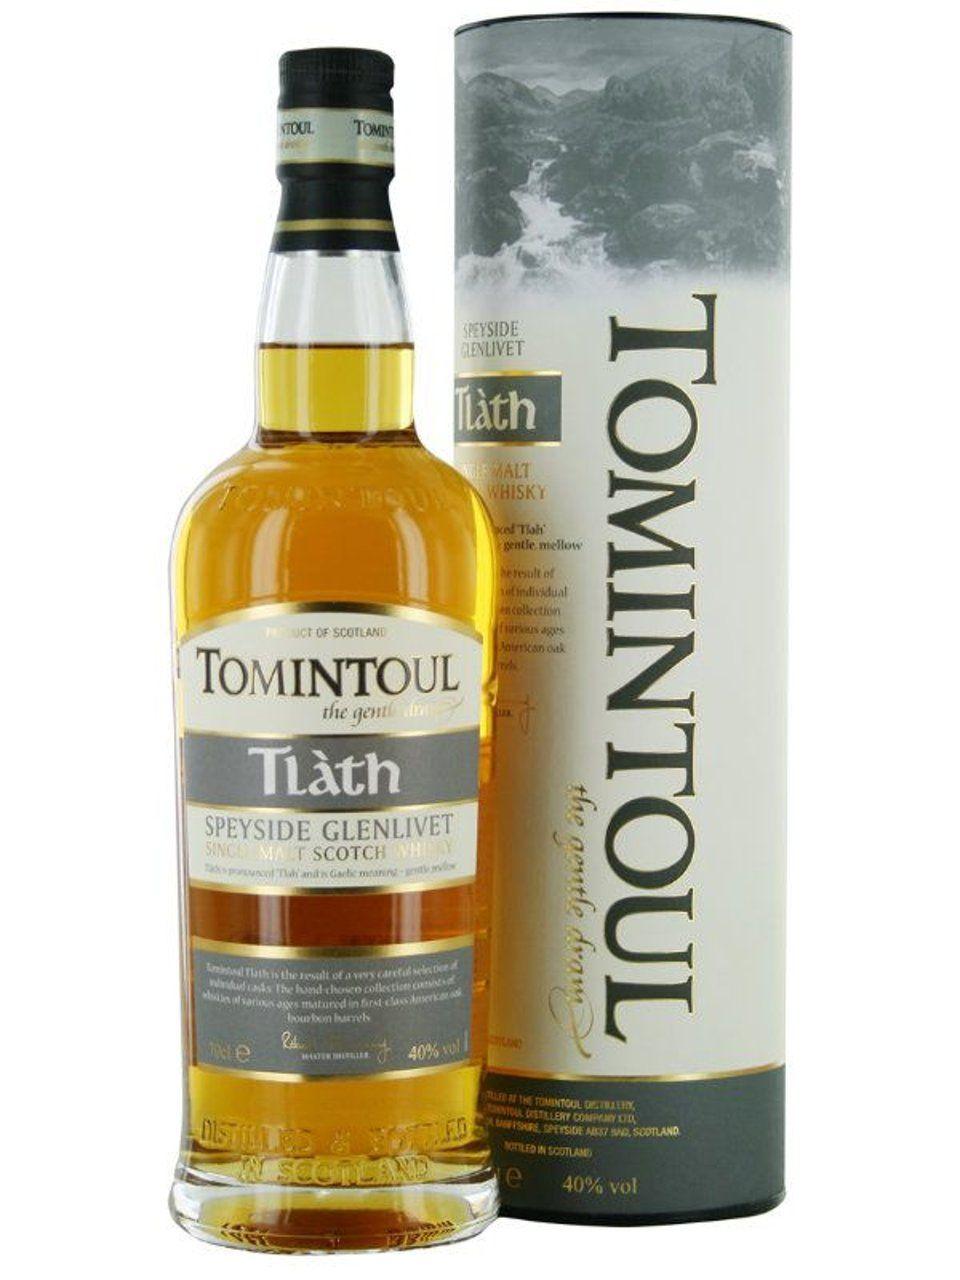 Tomintoul Single Malt Tlath Speyside 0,7 ltr